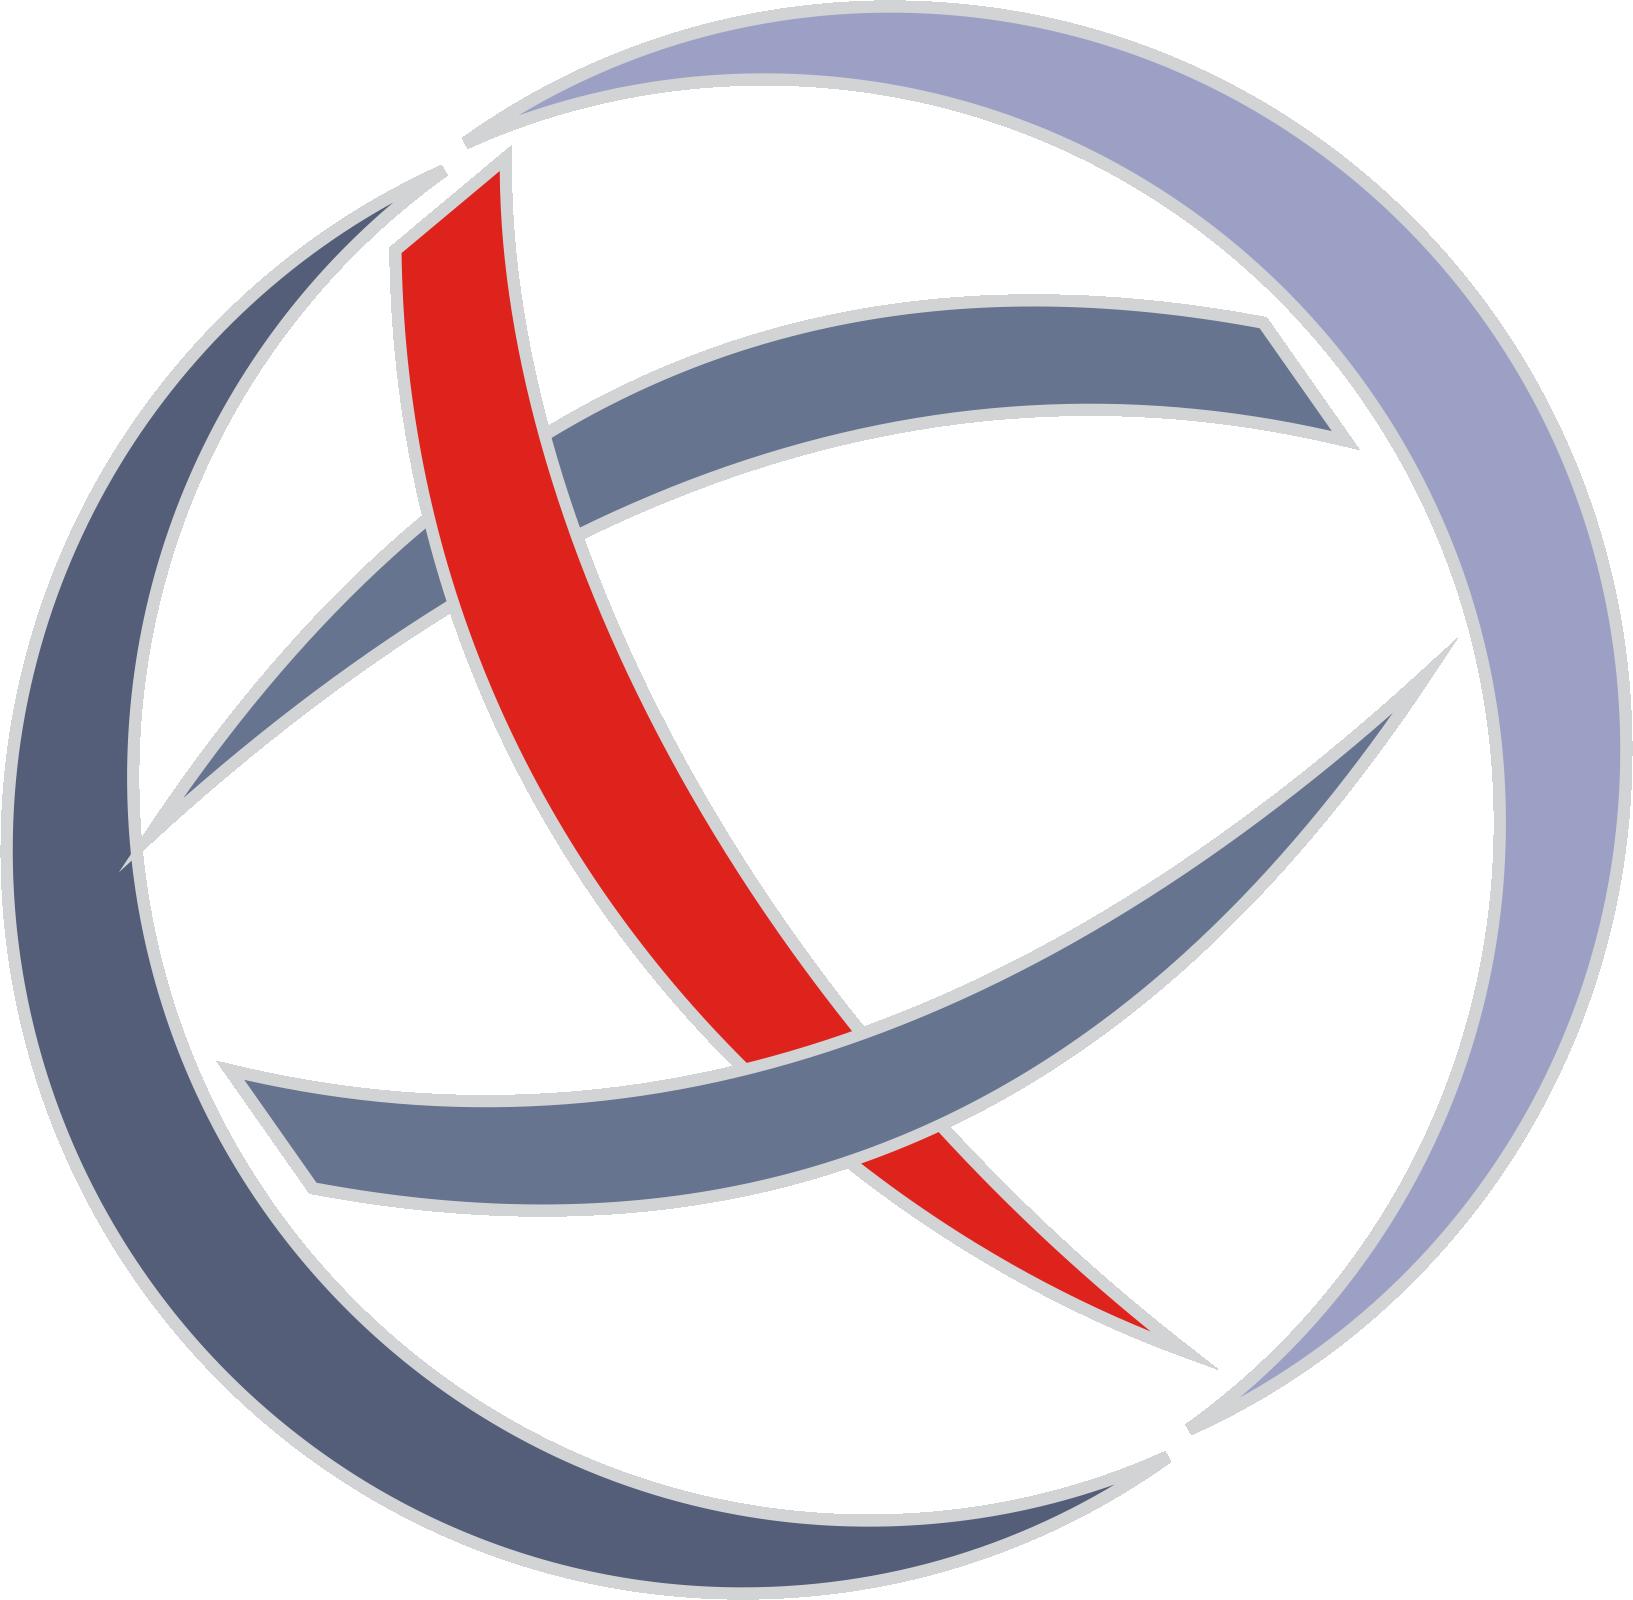 logomarca[vetor]